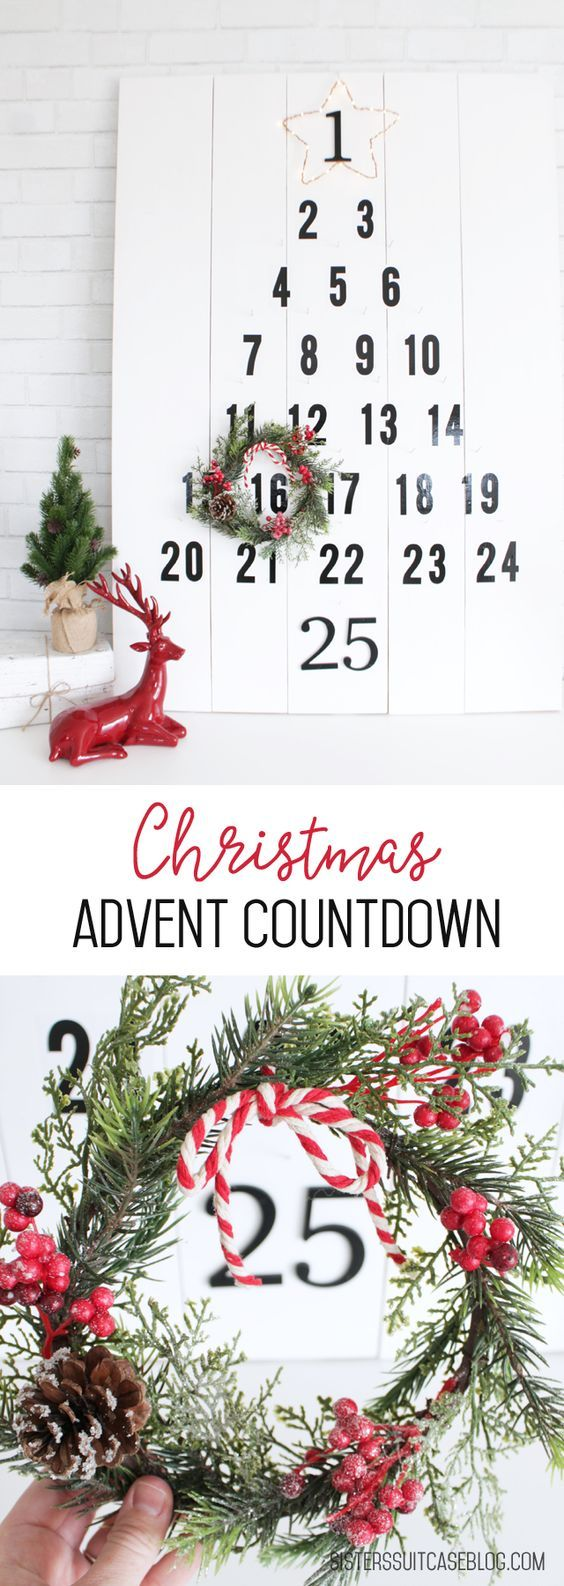 Christmas Tree Advent Countdown tutorial via sisterssuitcaseblog.com, or register to make your own at @HomeDepot's #DIHWorkshop #sponsored